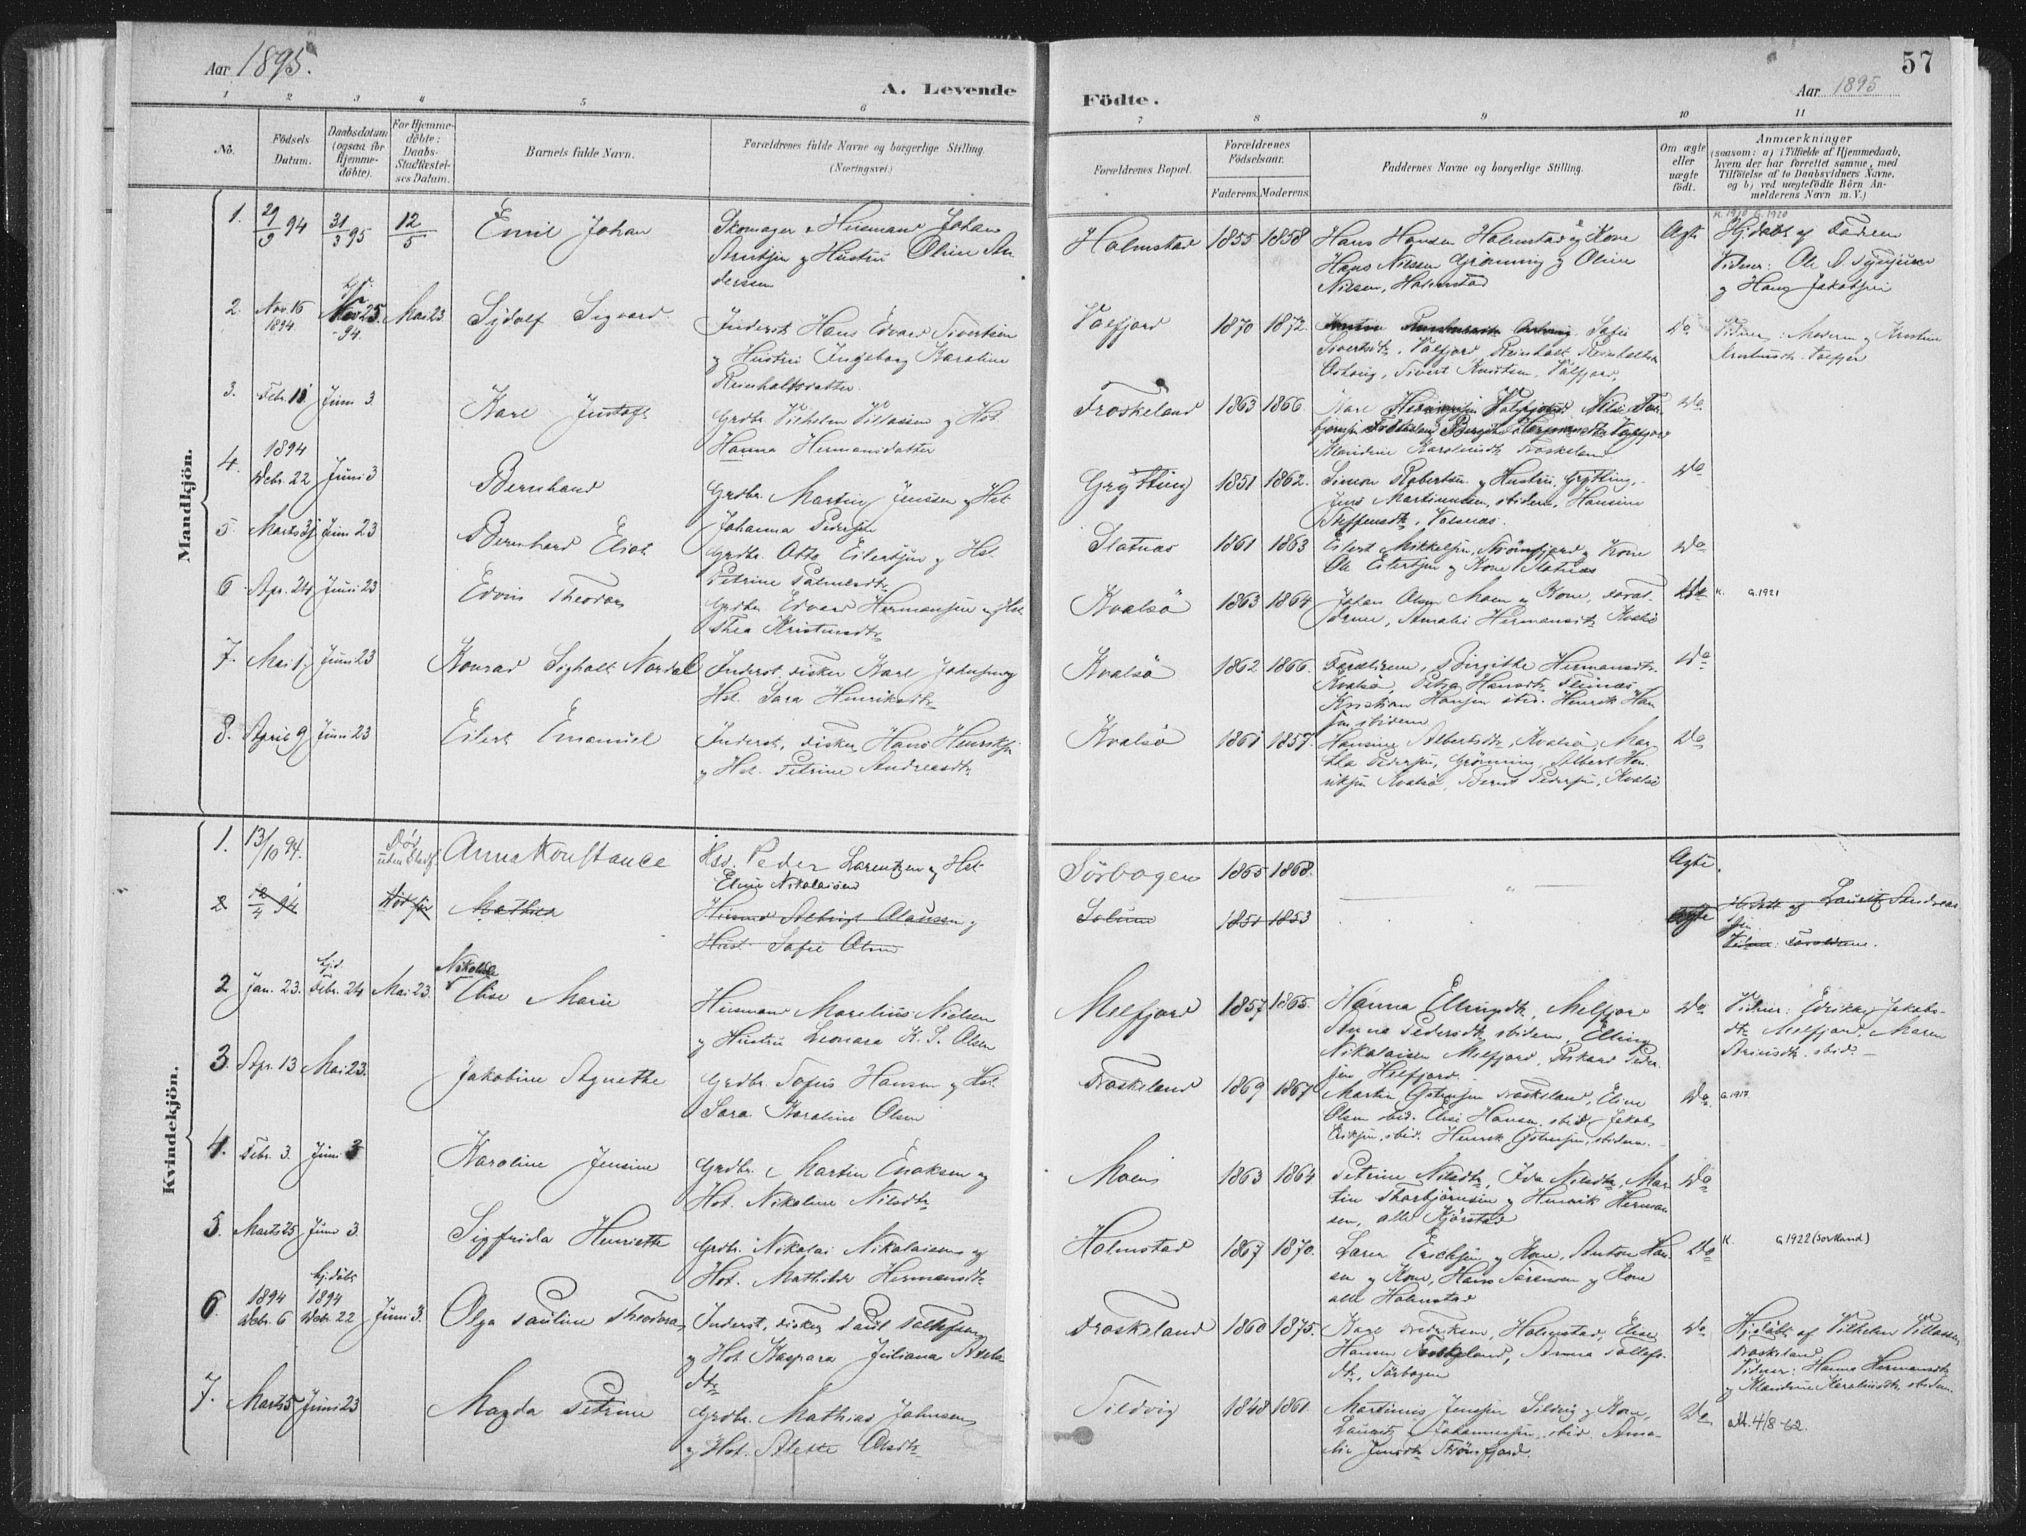 SAT, Ministerialprotokoller, klokkerbøker og fødselsregistre - Nordland, 890/L1286: Ministerialbok nr. 890A01, 1882-1902, s. 57